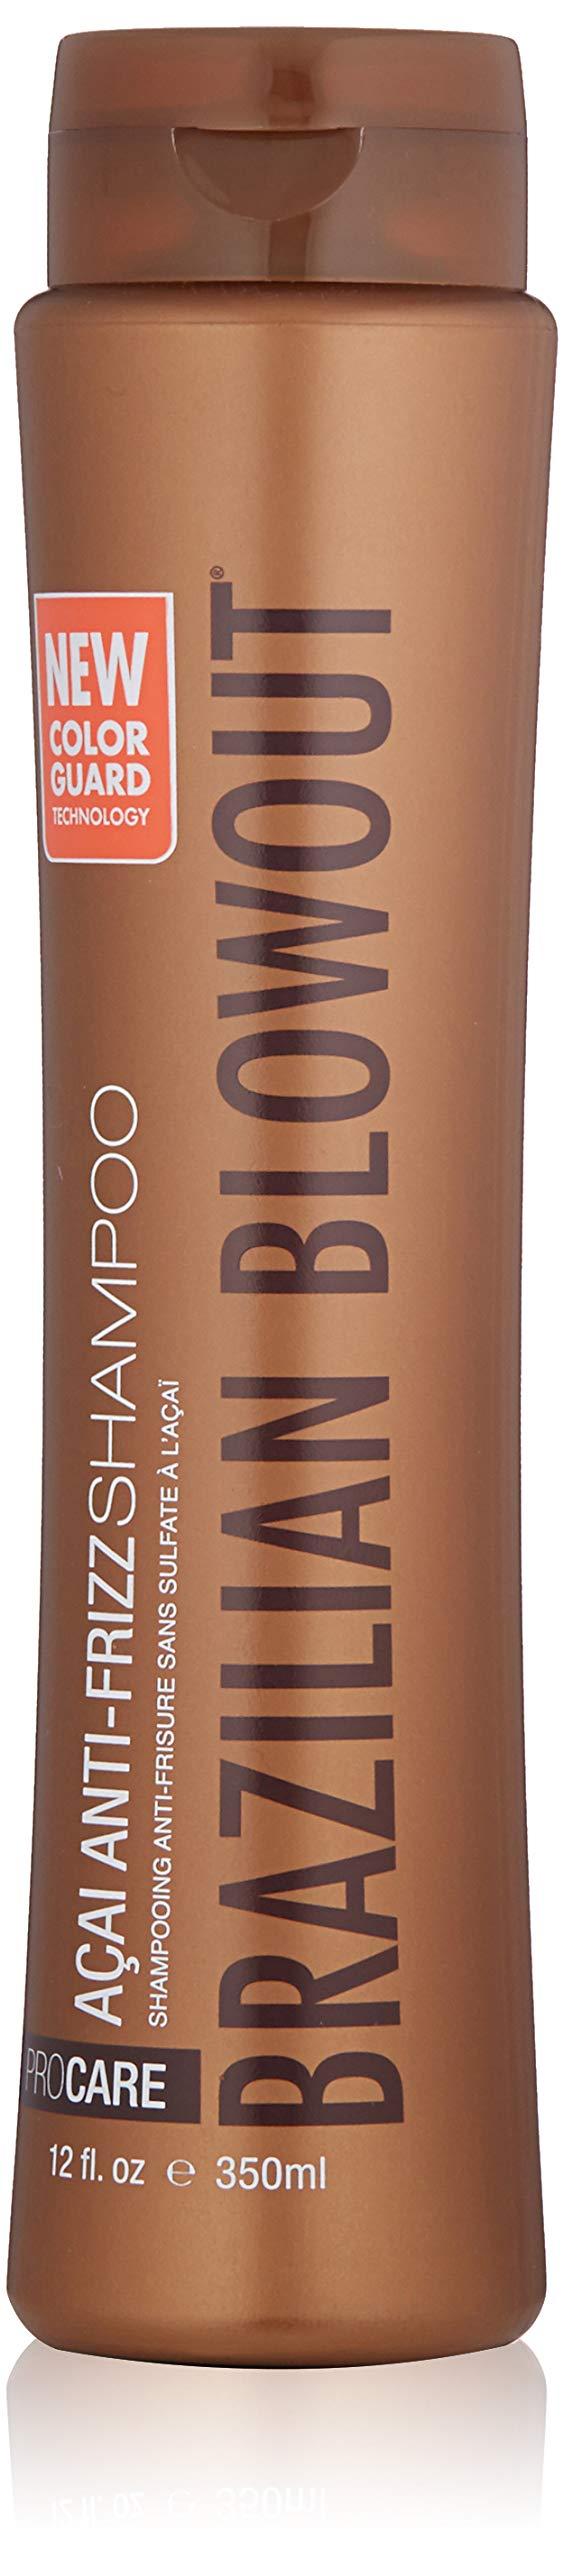 Brazilian Blowout Acai Anti Frizz Shampoo, 12 Fl Oz by BRAZILIAN BLOWOUT